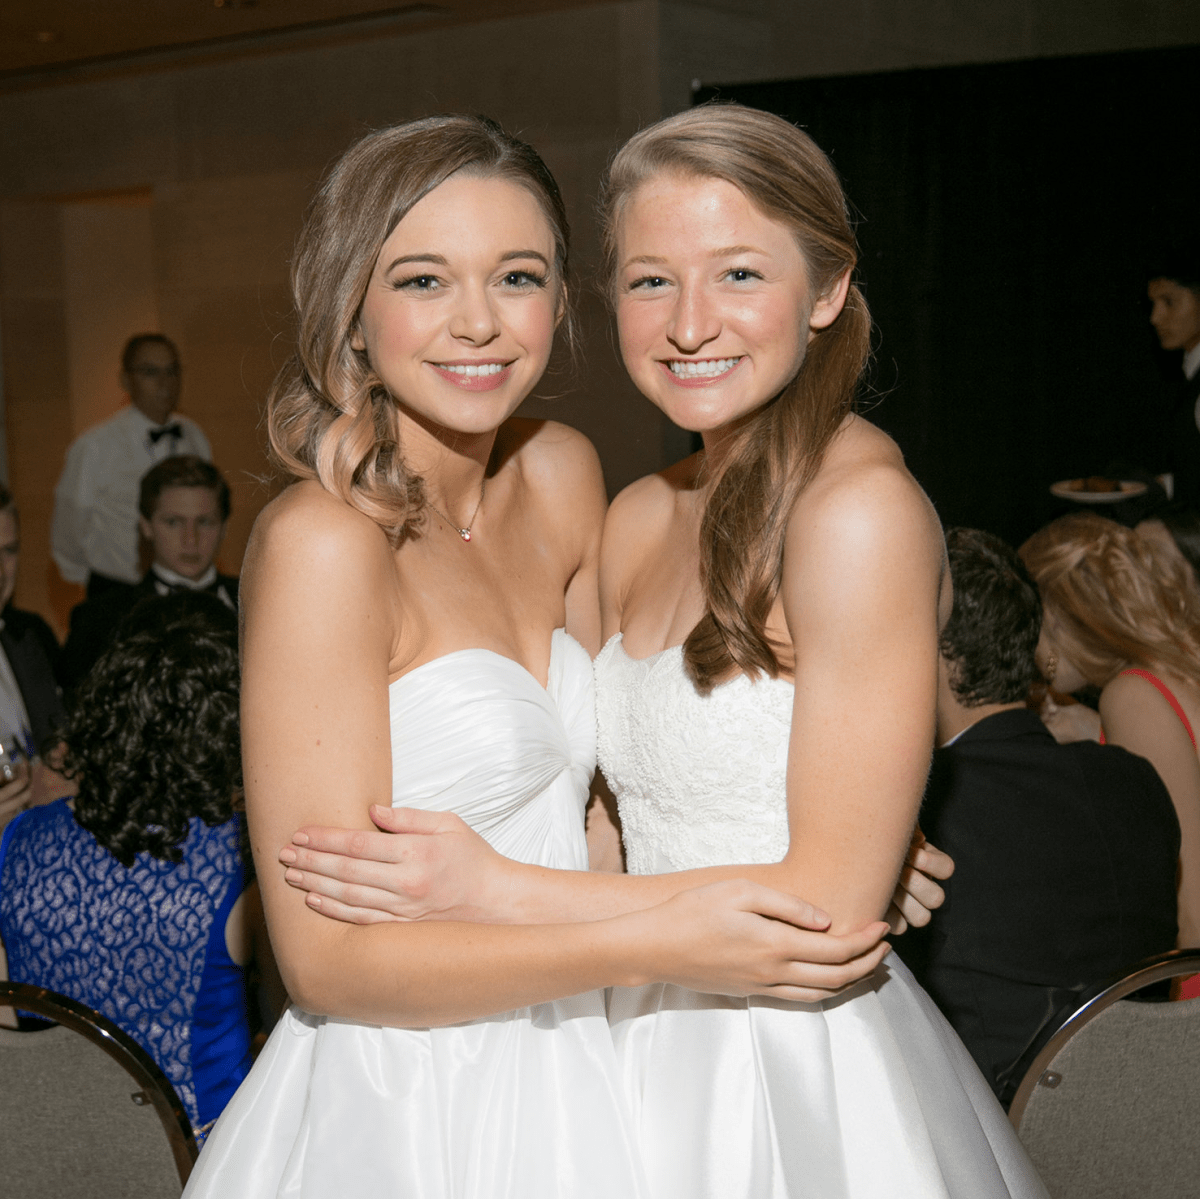 Ashlyn Matthews and Juliana McIlveene